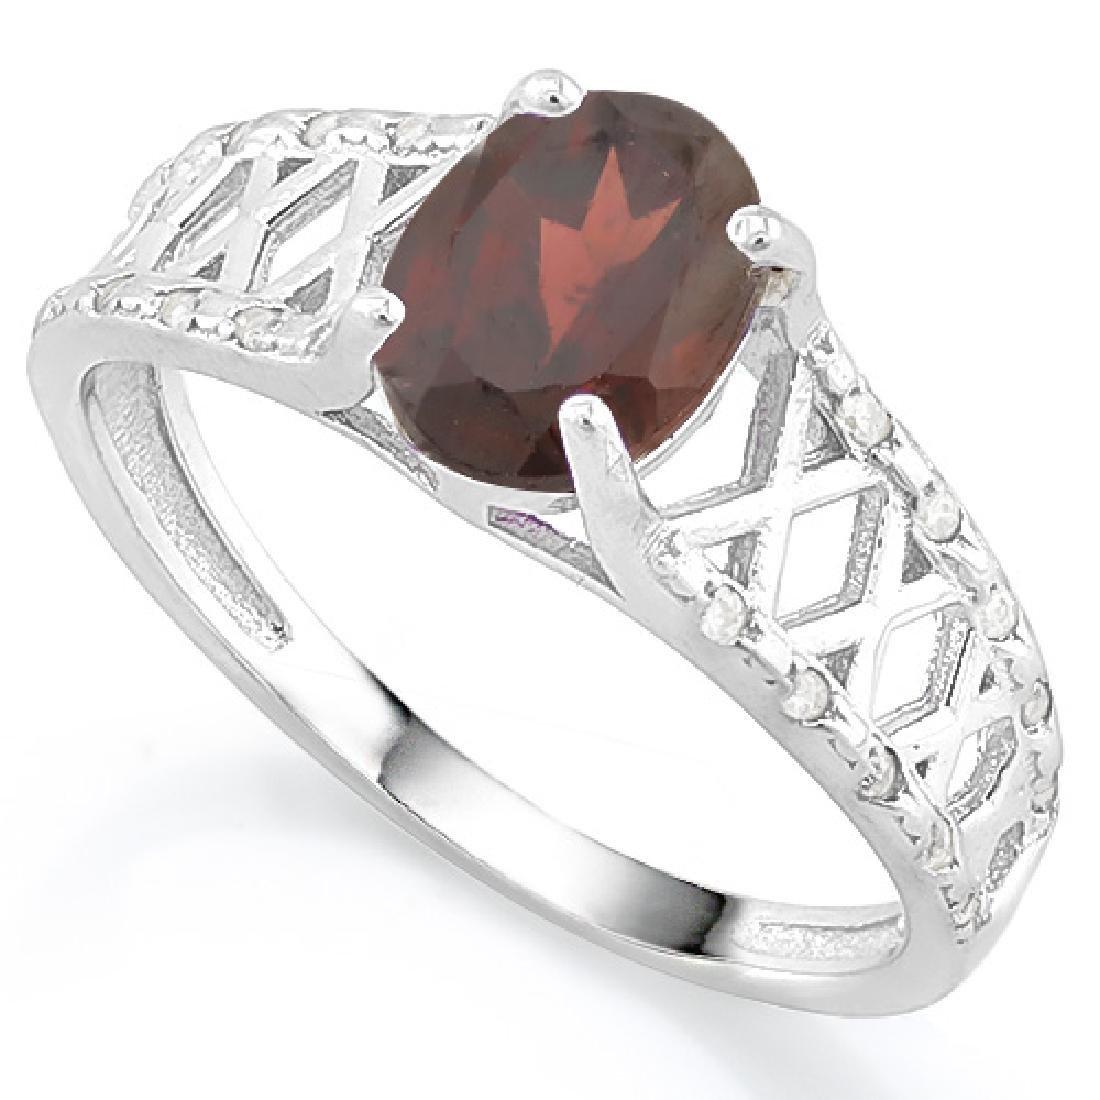 1 2/5 CARAT GARNET & (20 PCS) FLAWLESS CREATED DIAMOND